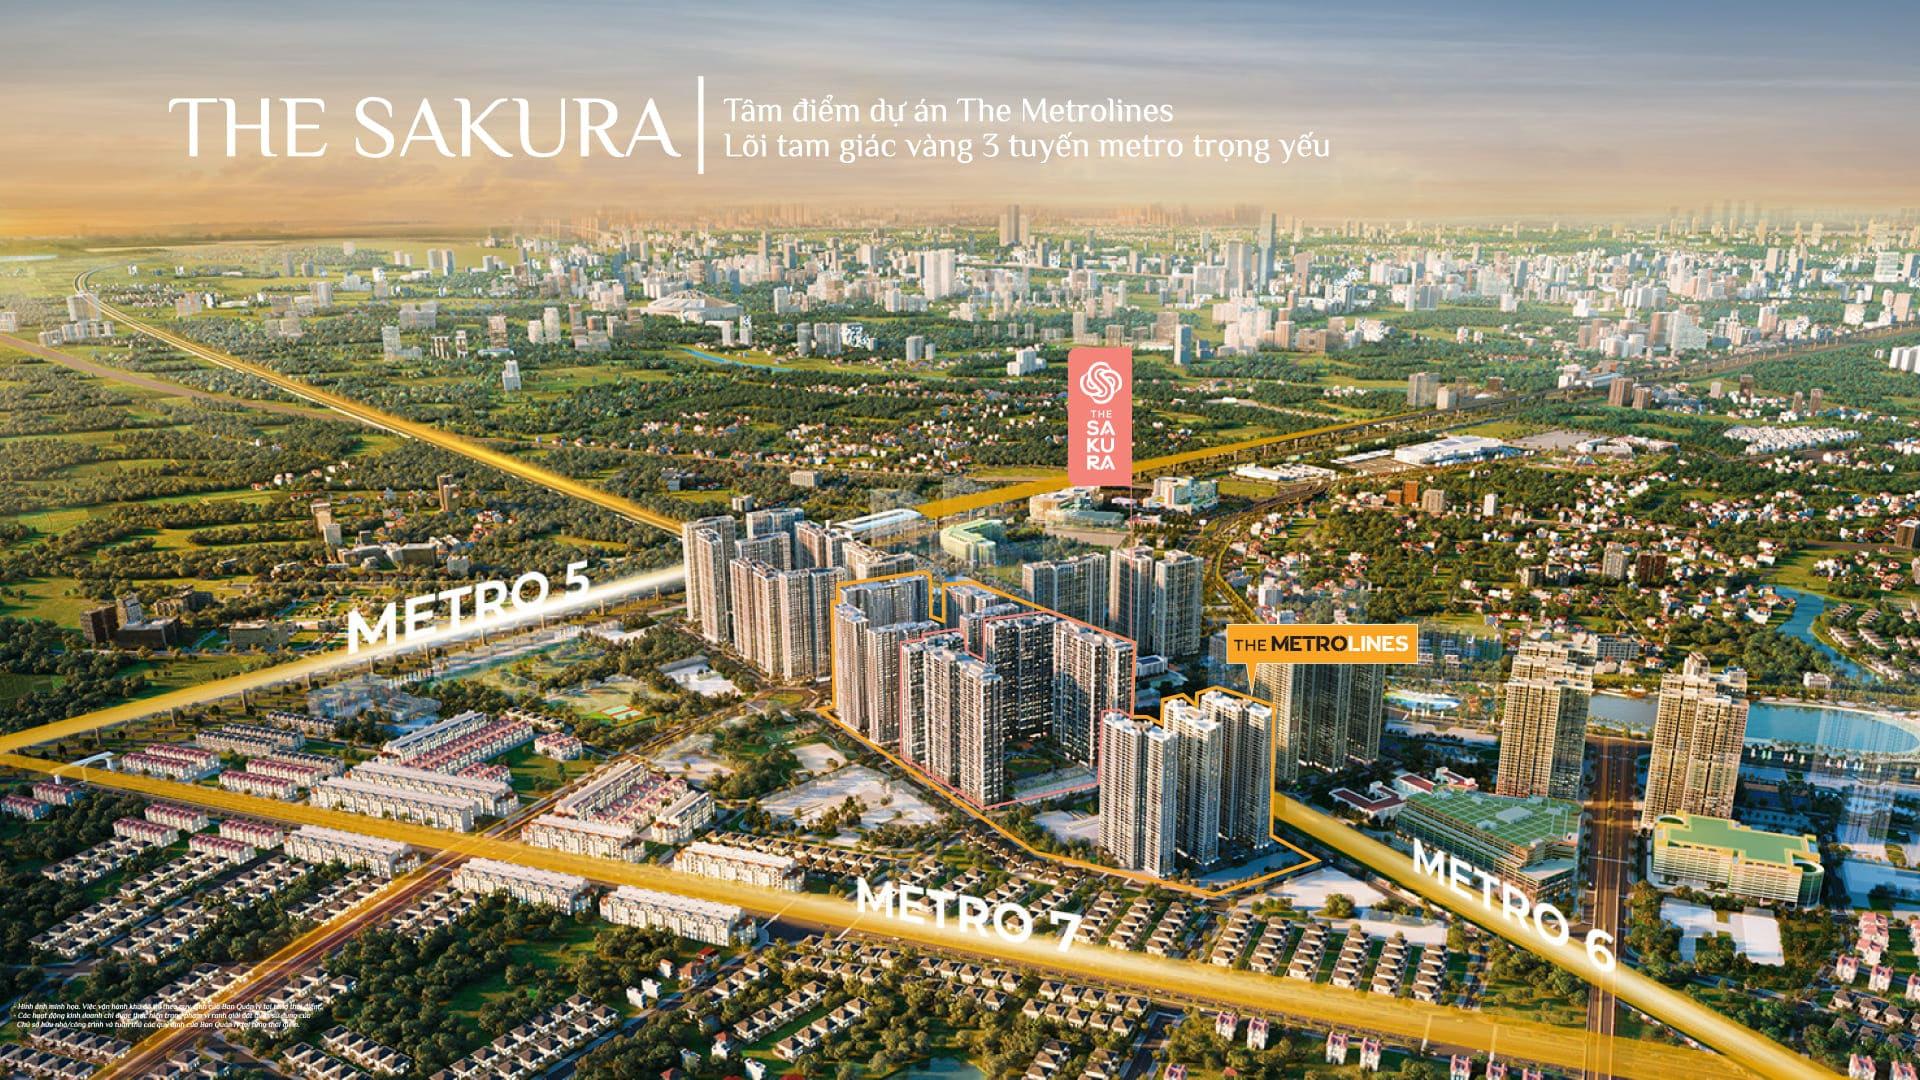 the sakura vinhomes smart city